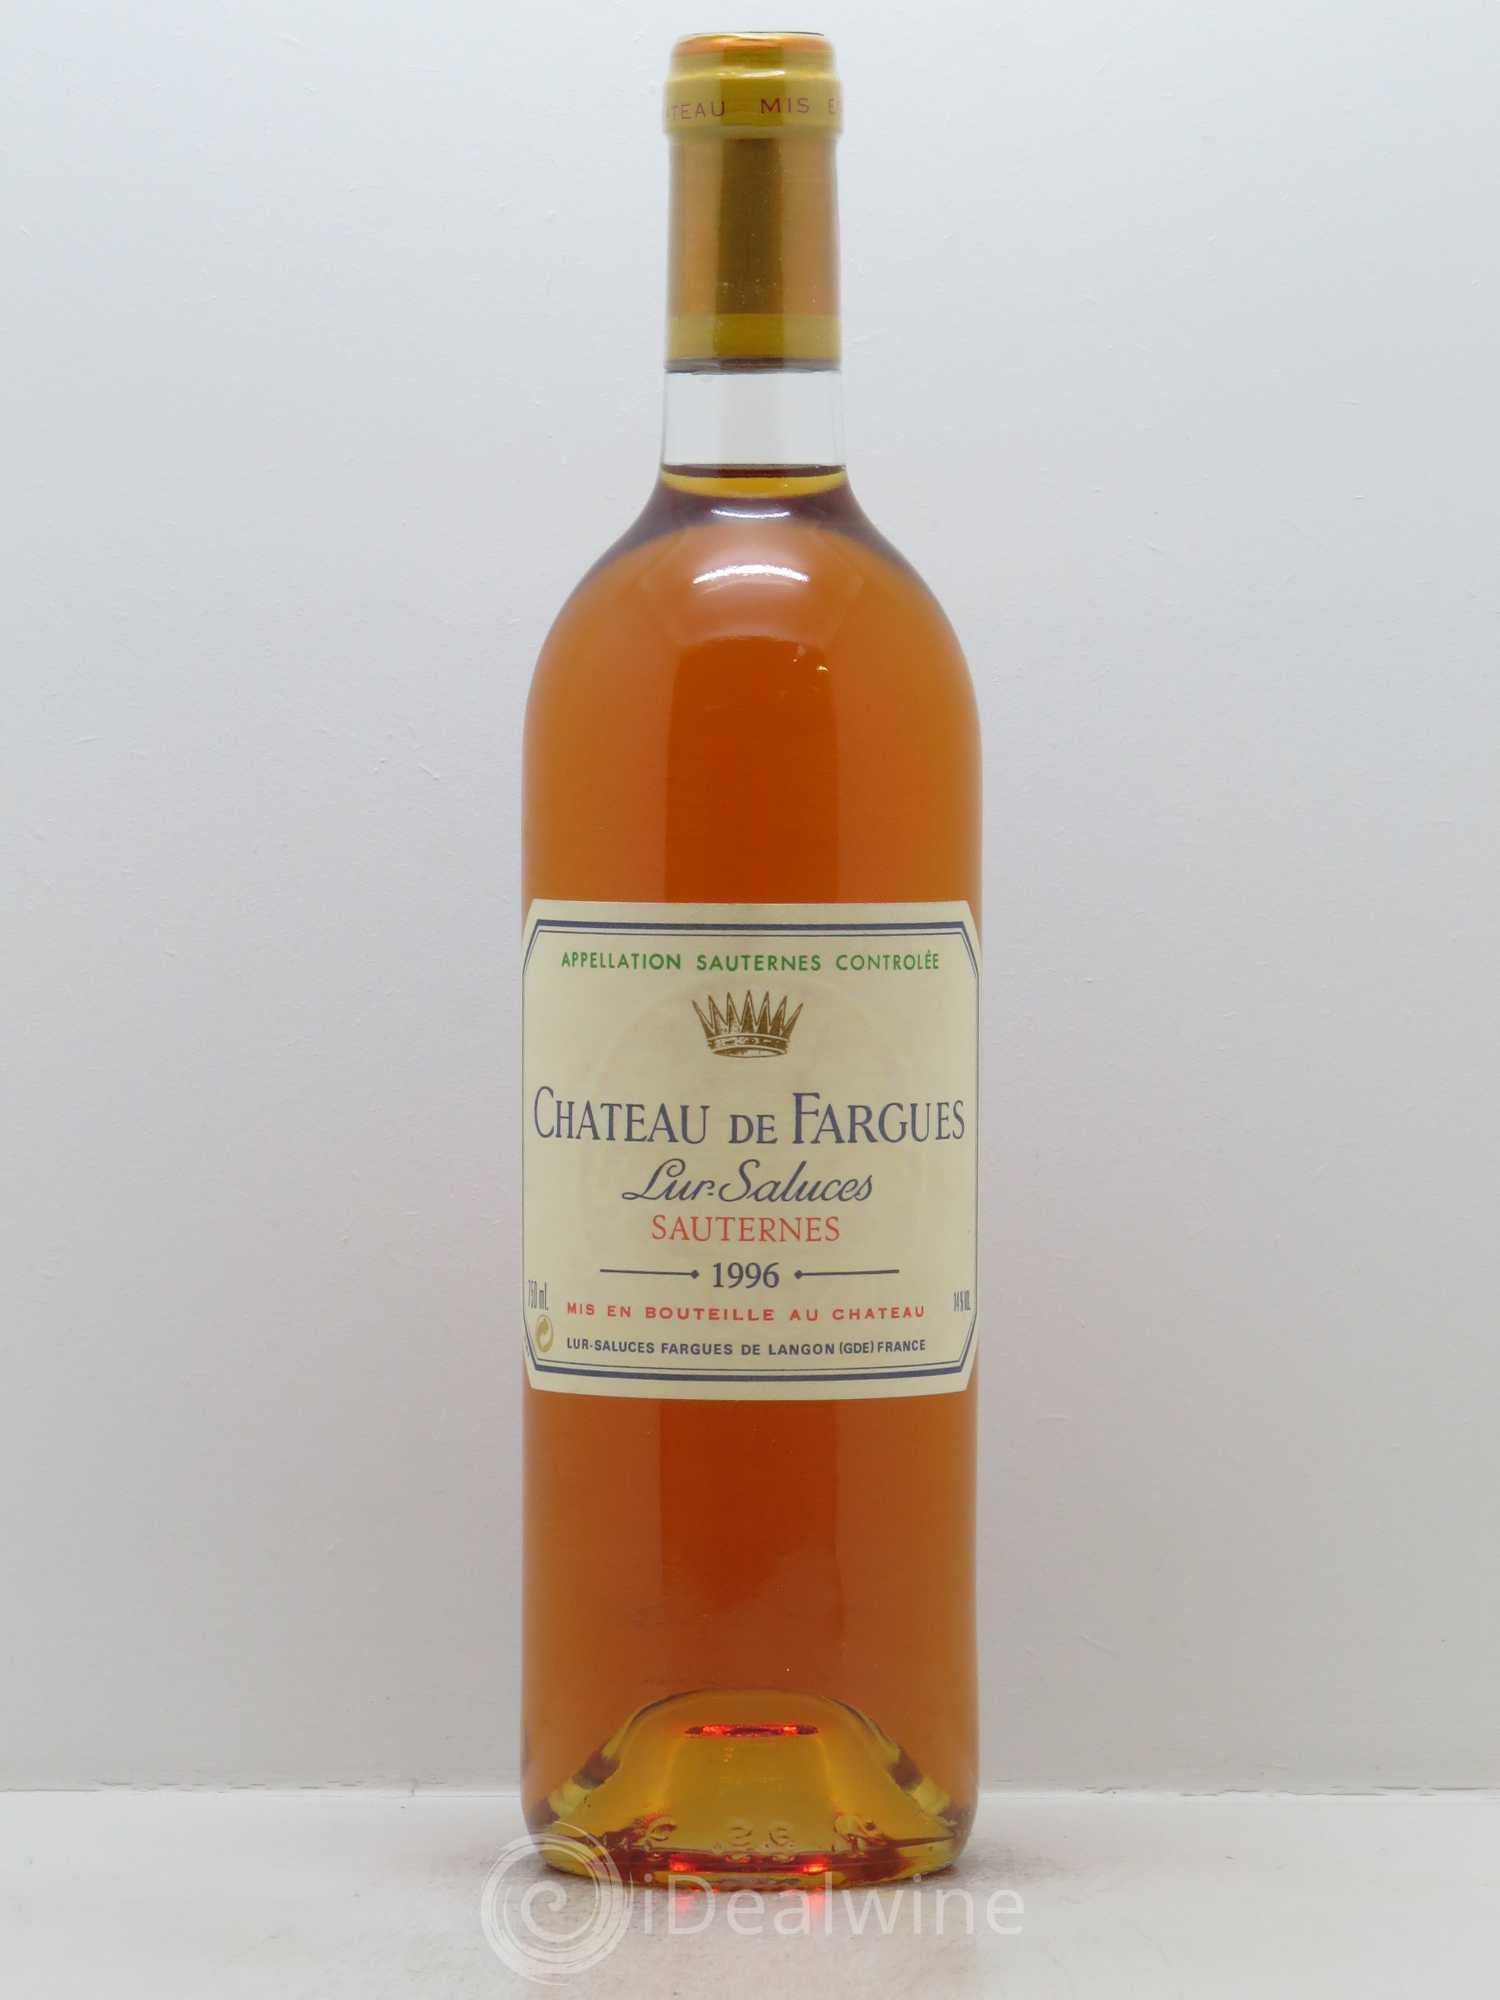 Buy ch teau de fargues 1996 lot 2318 for Buy chateaubriand